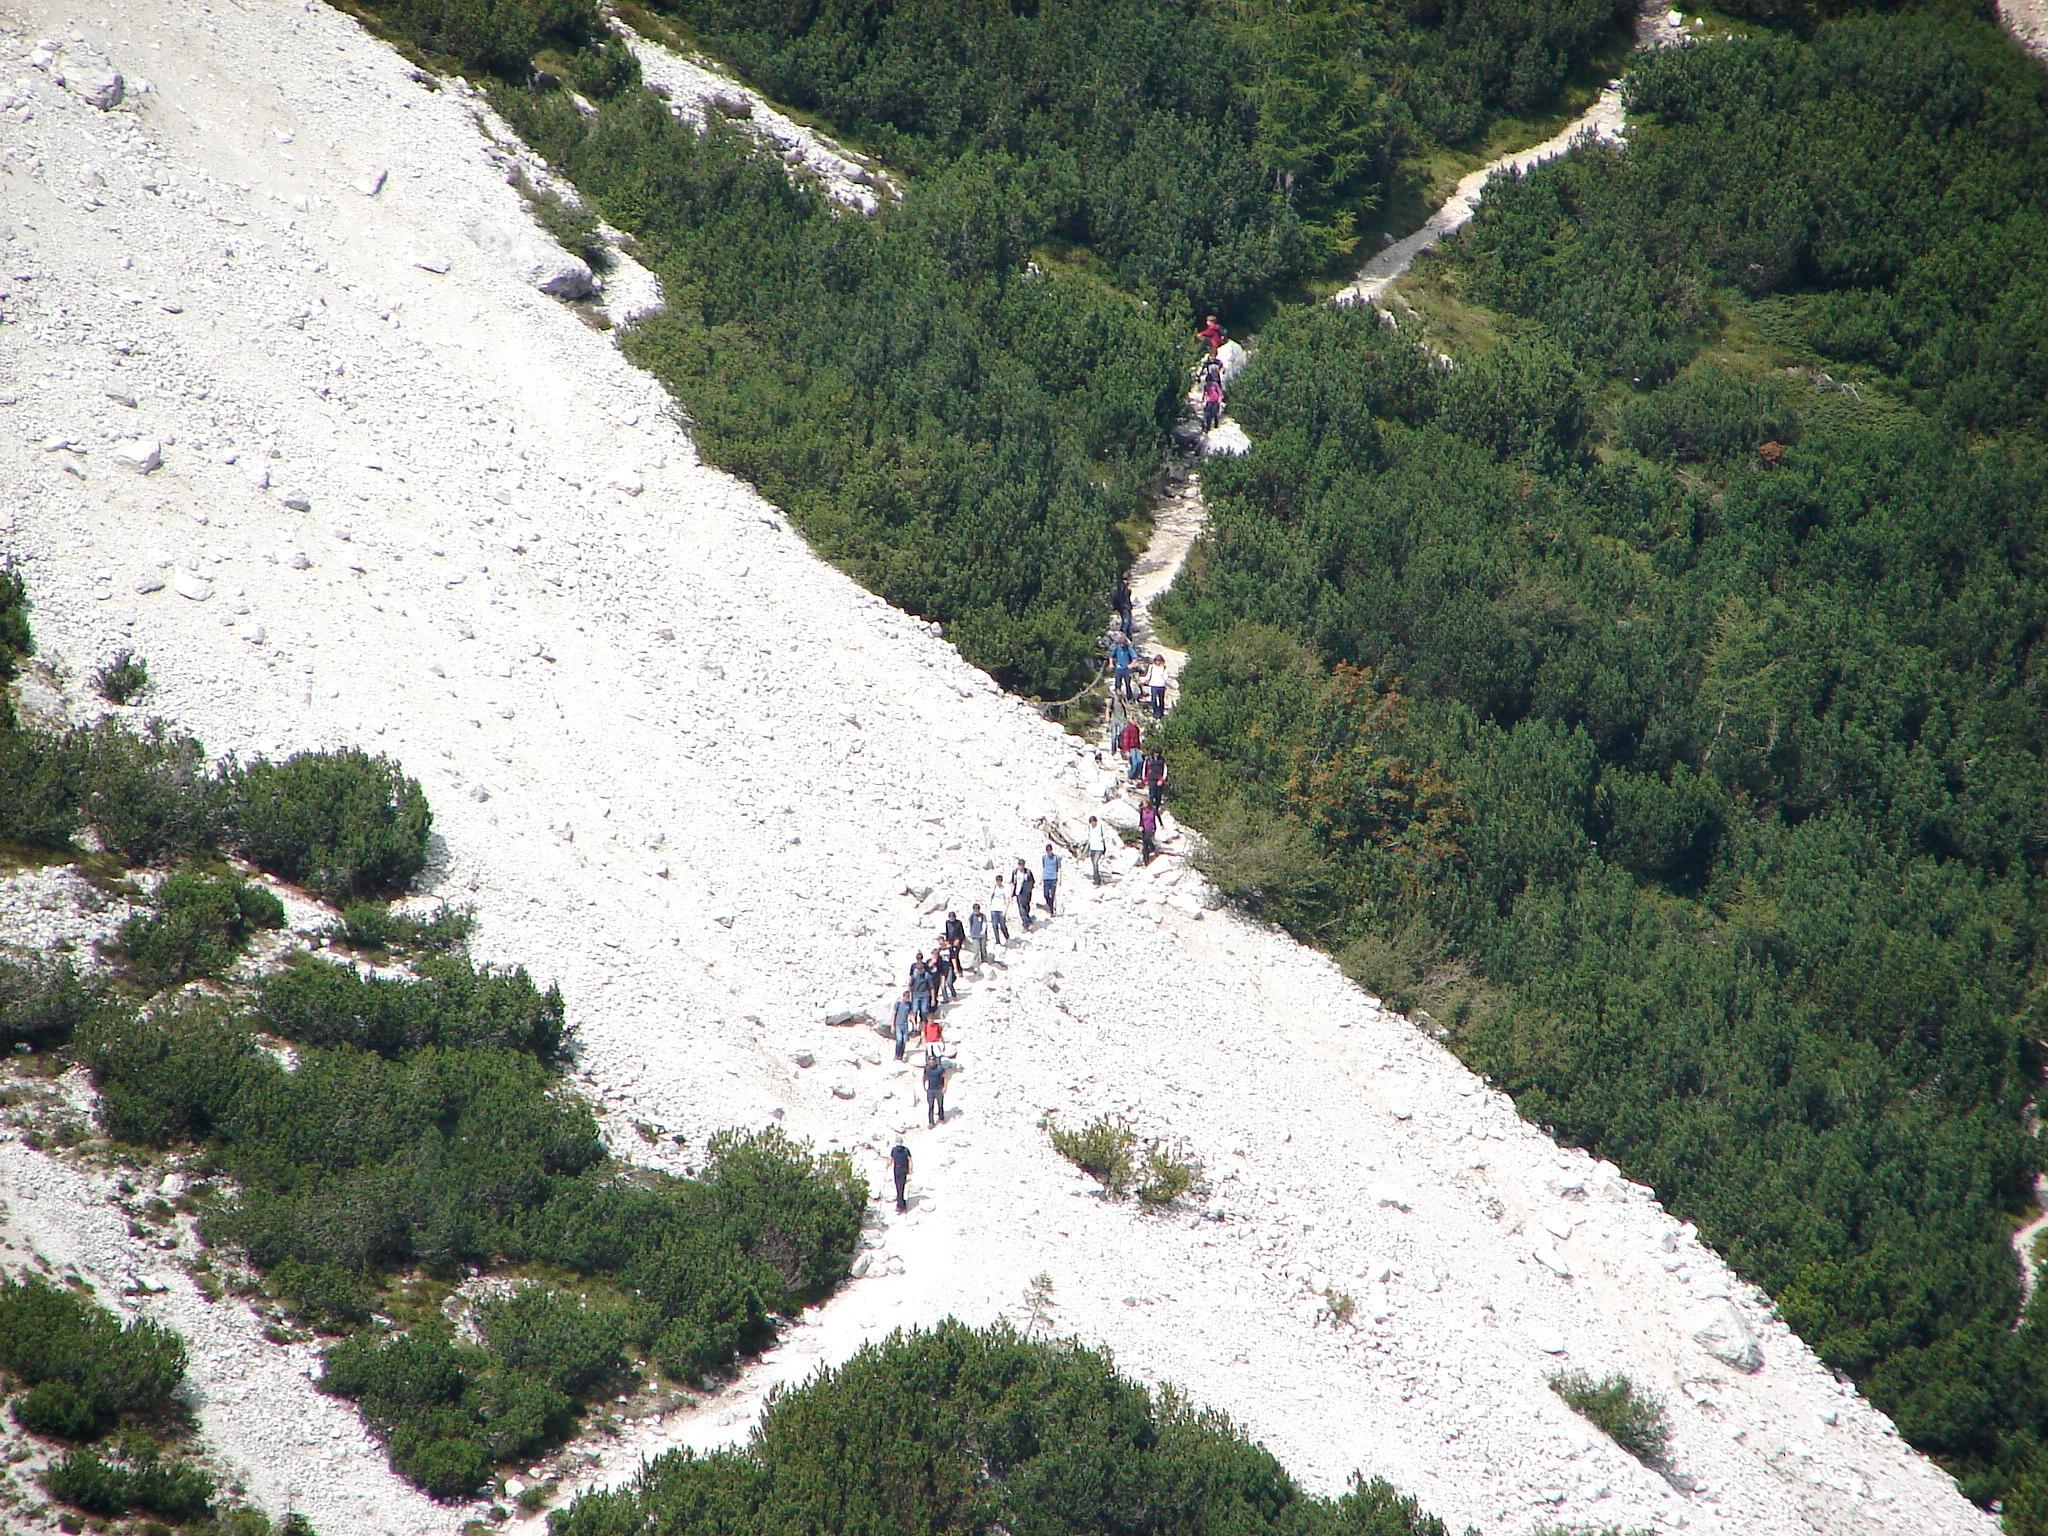 Passeggiata in montagna by meiferdinando